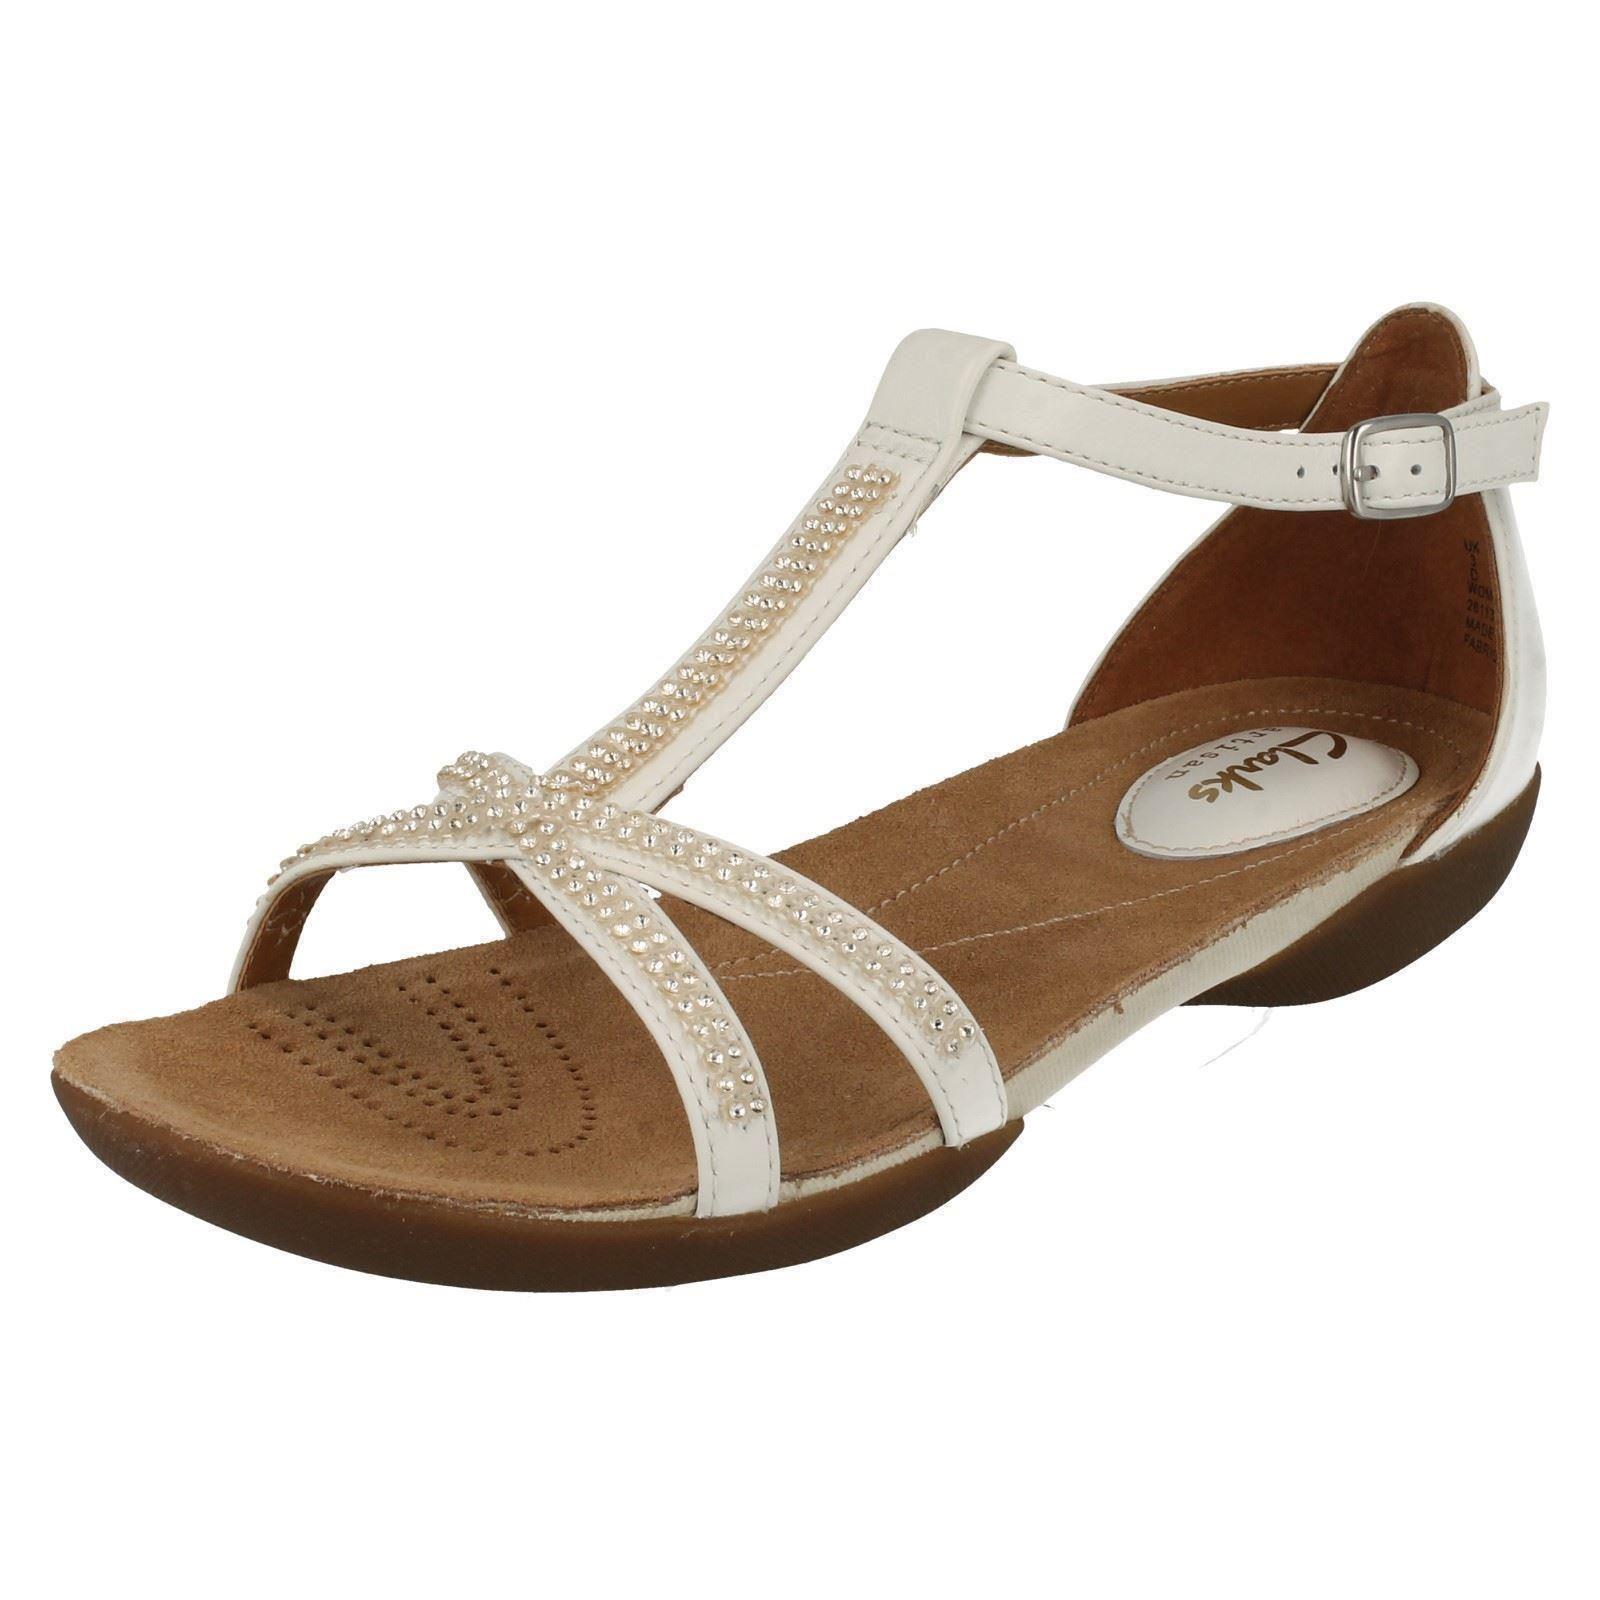 Ladies Clarks Casual Summer Sandals Raffi Star Ebay